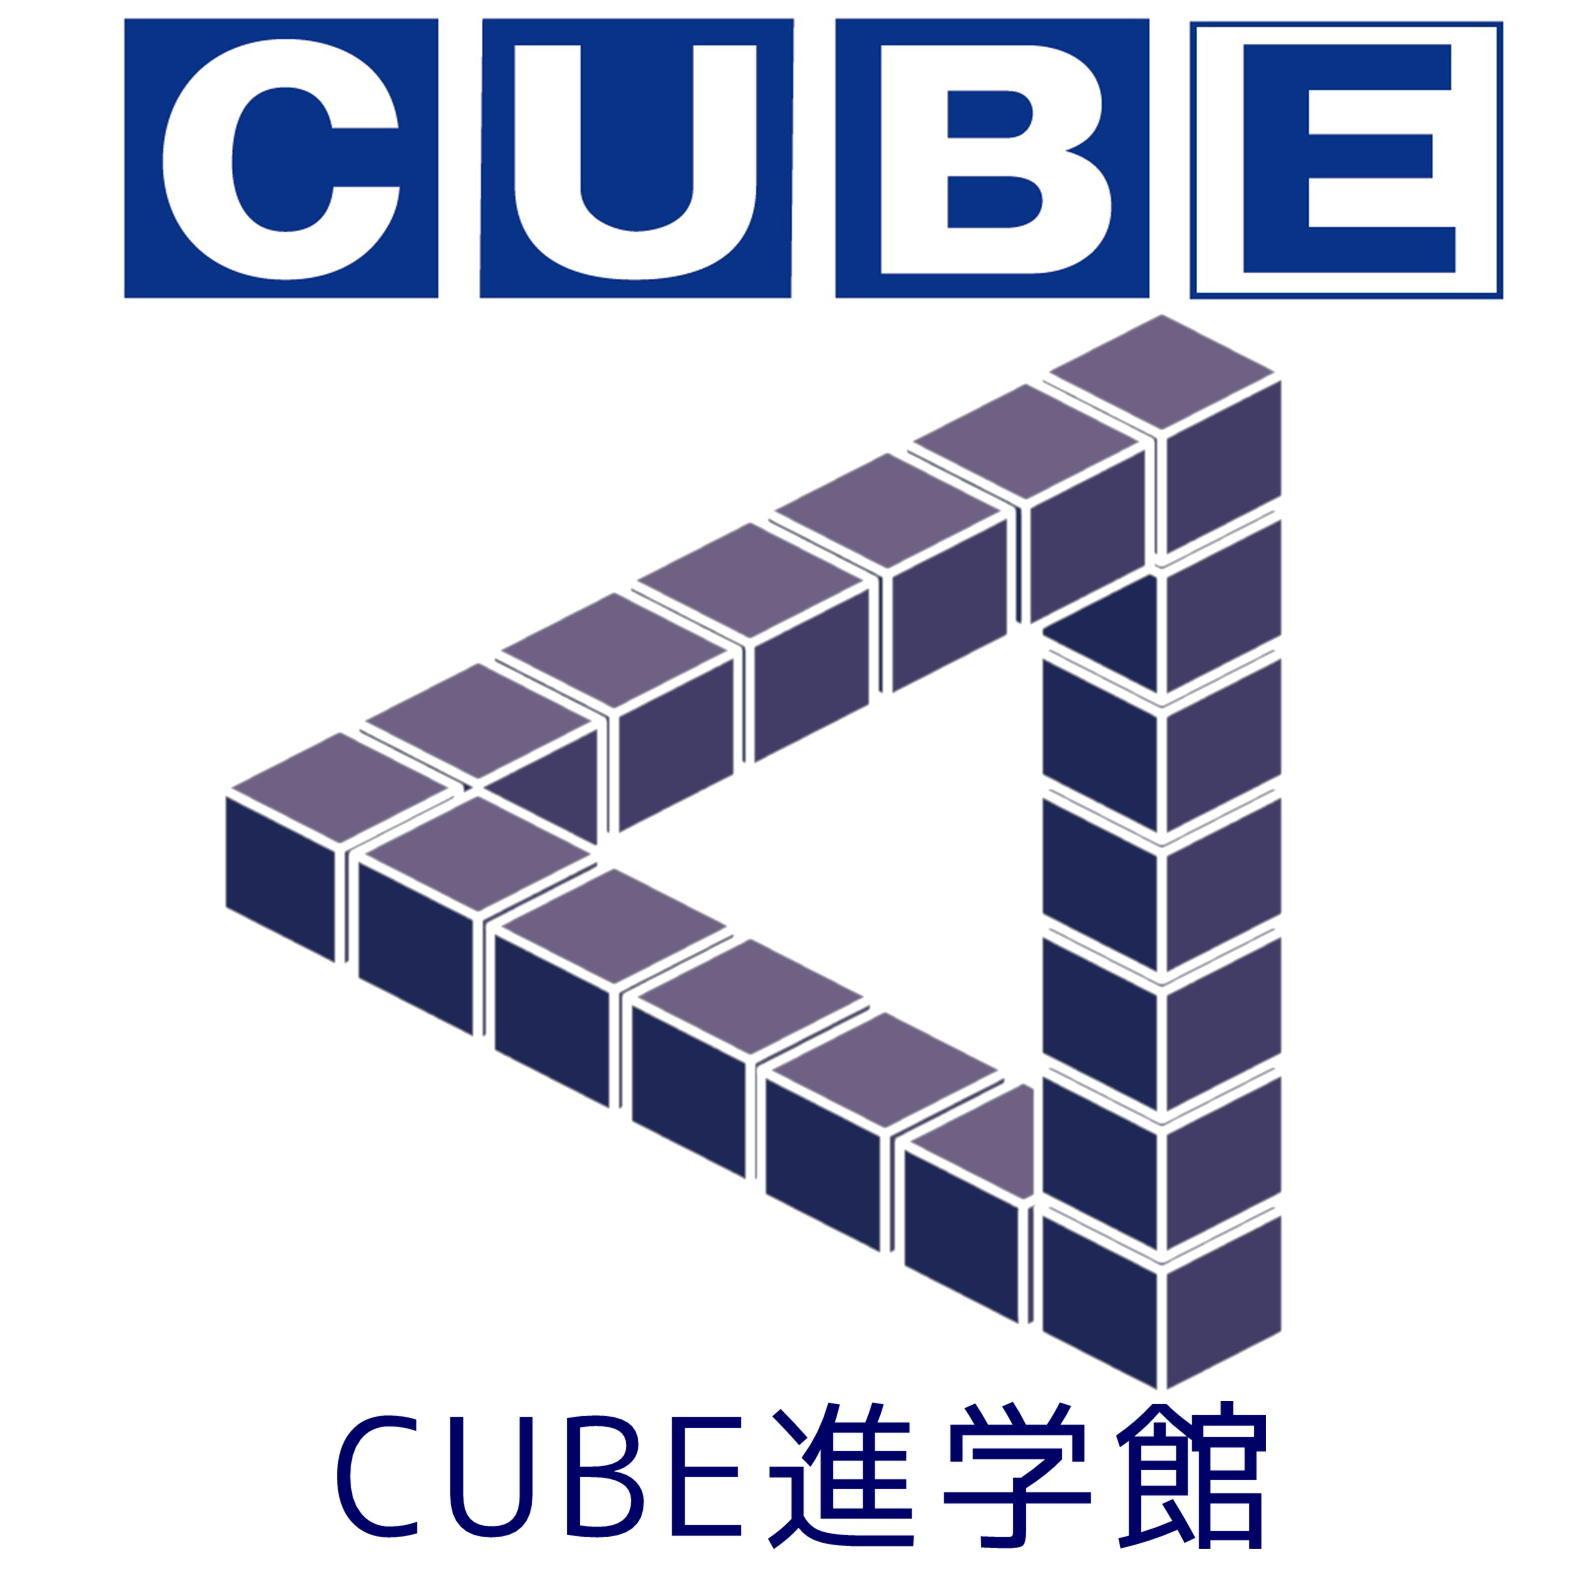 CUBE進学館 松戸牧の原教室